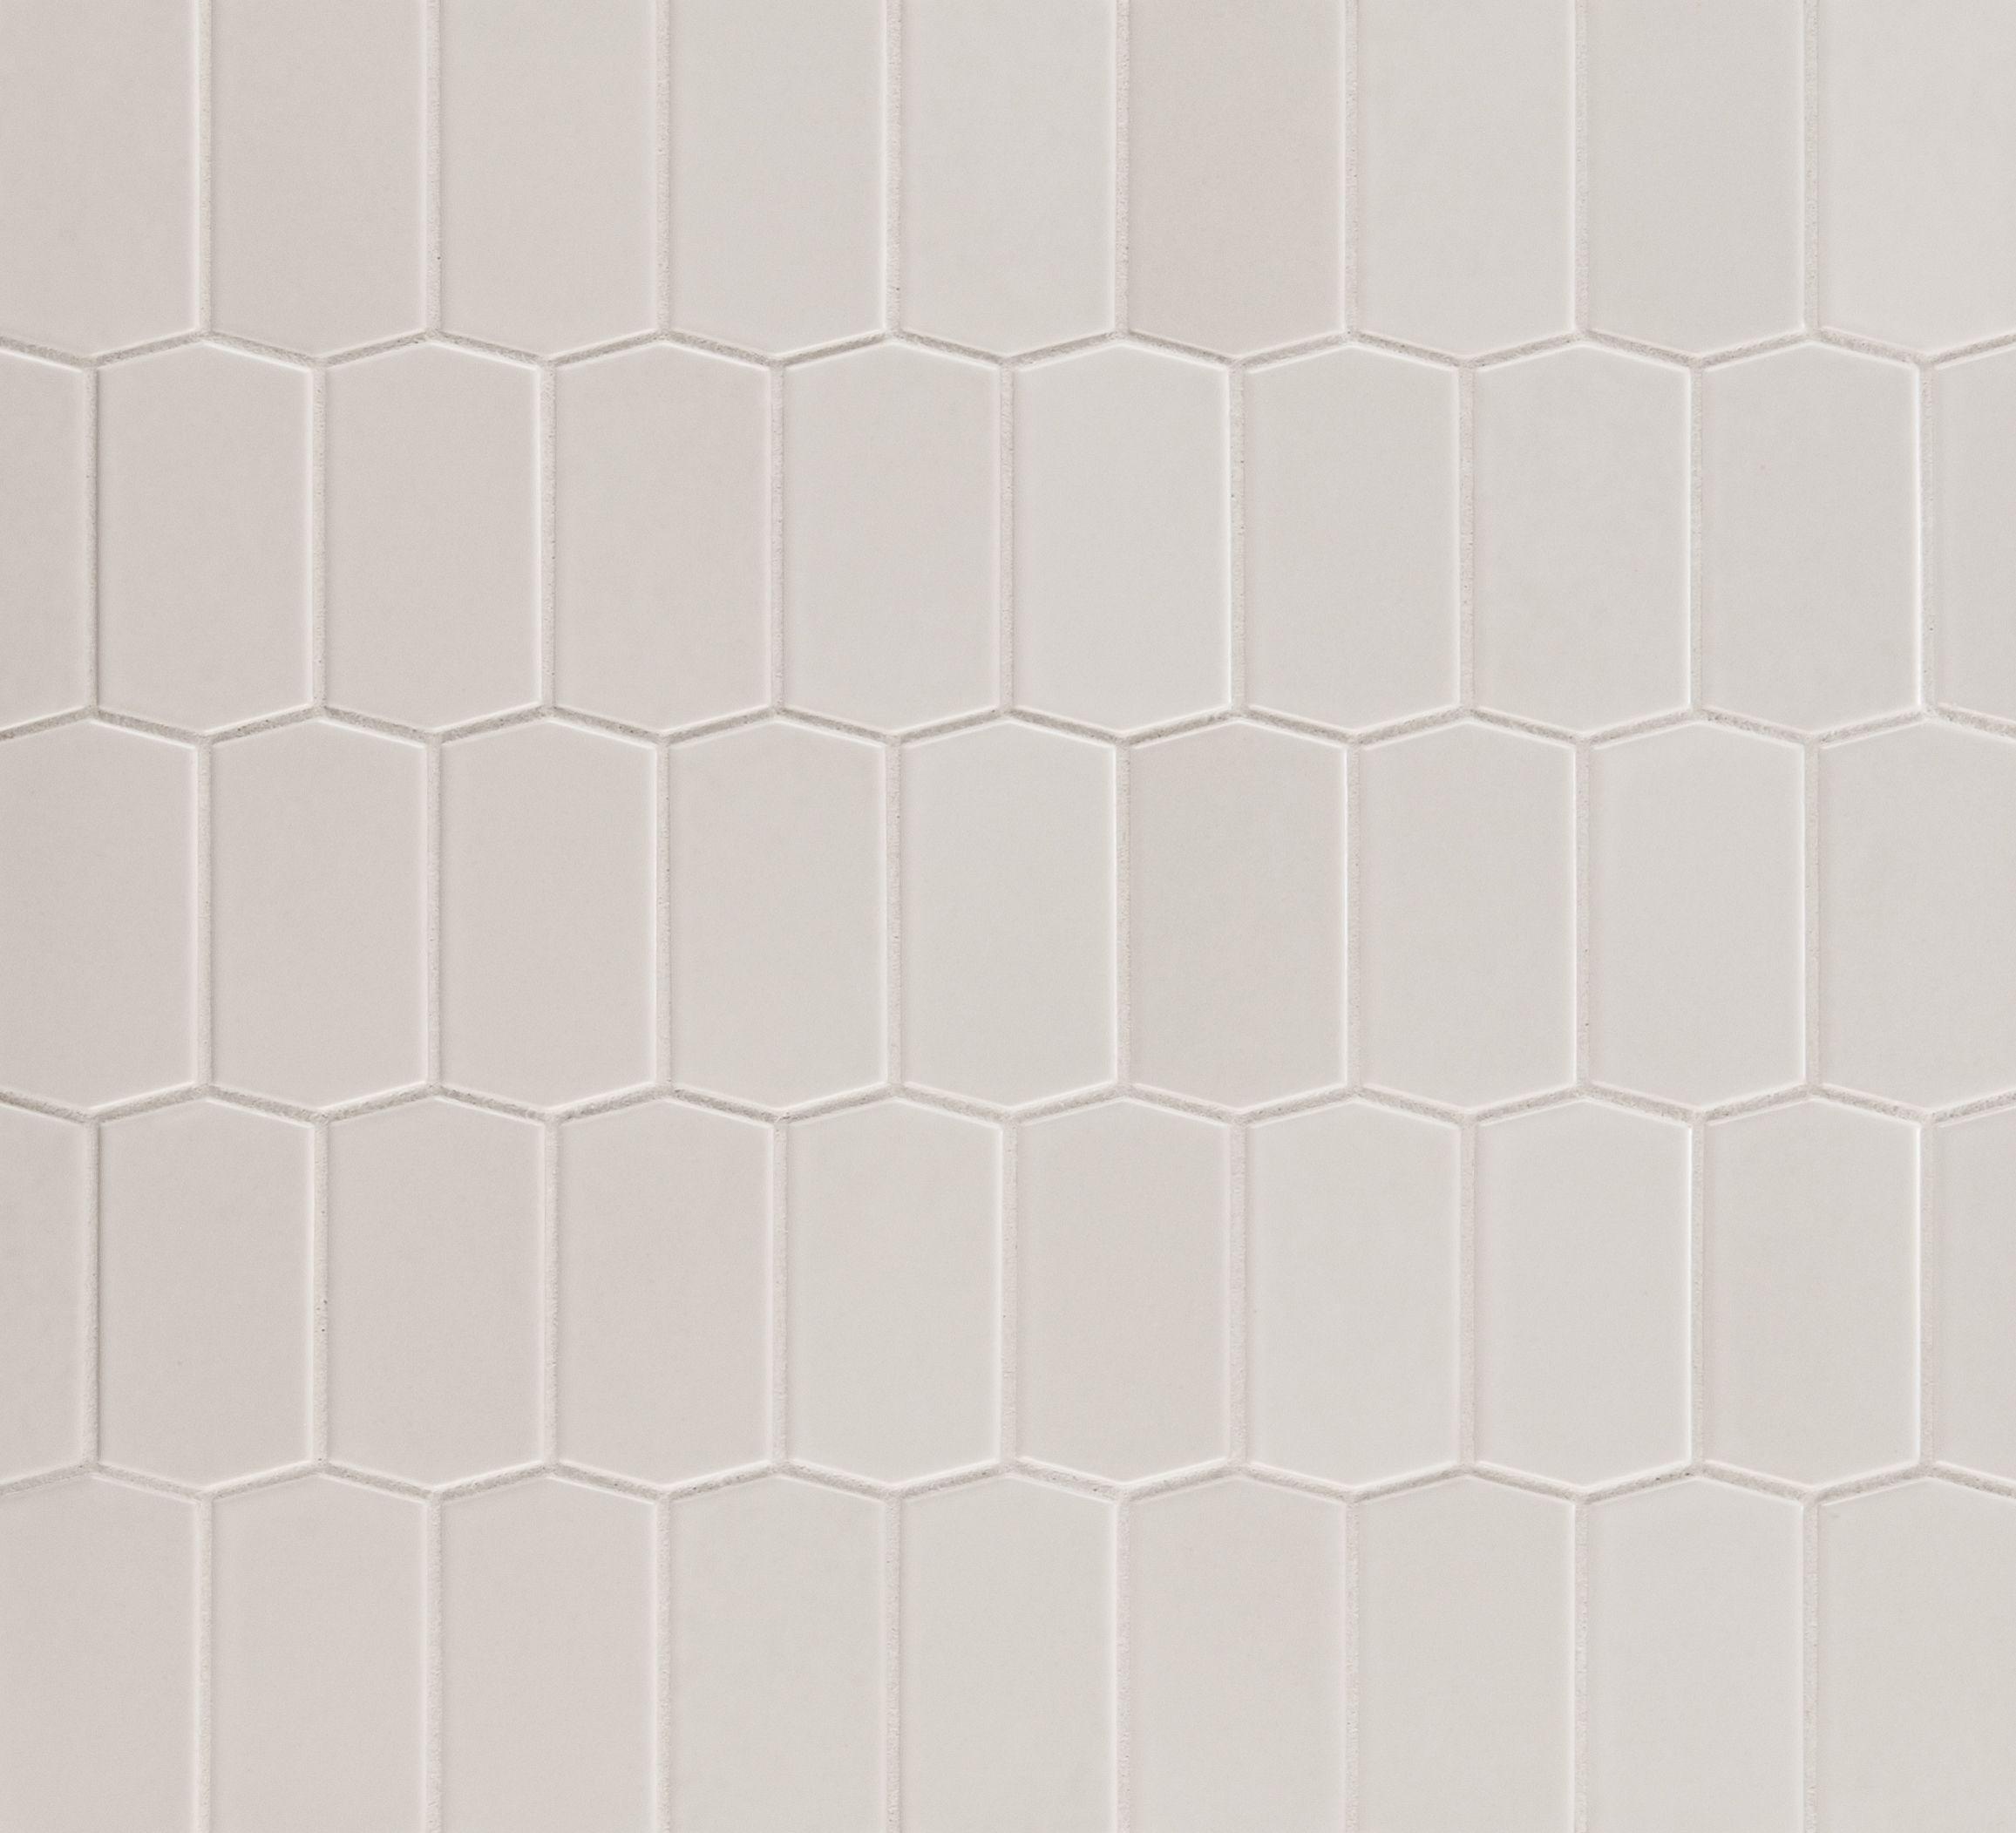 Ann Sacks Mosaic Bathroom Tile: ANN SACKS Savoy Hive Ceramic Mosaic In Chalk